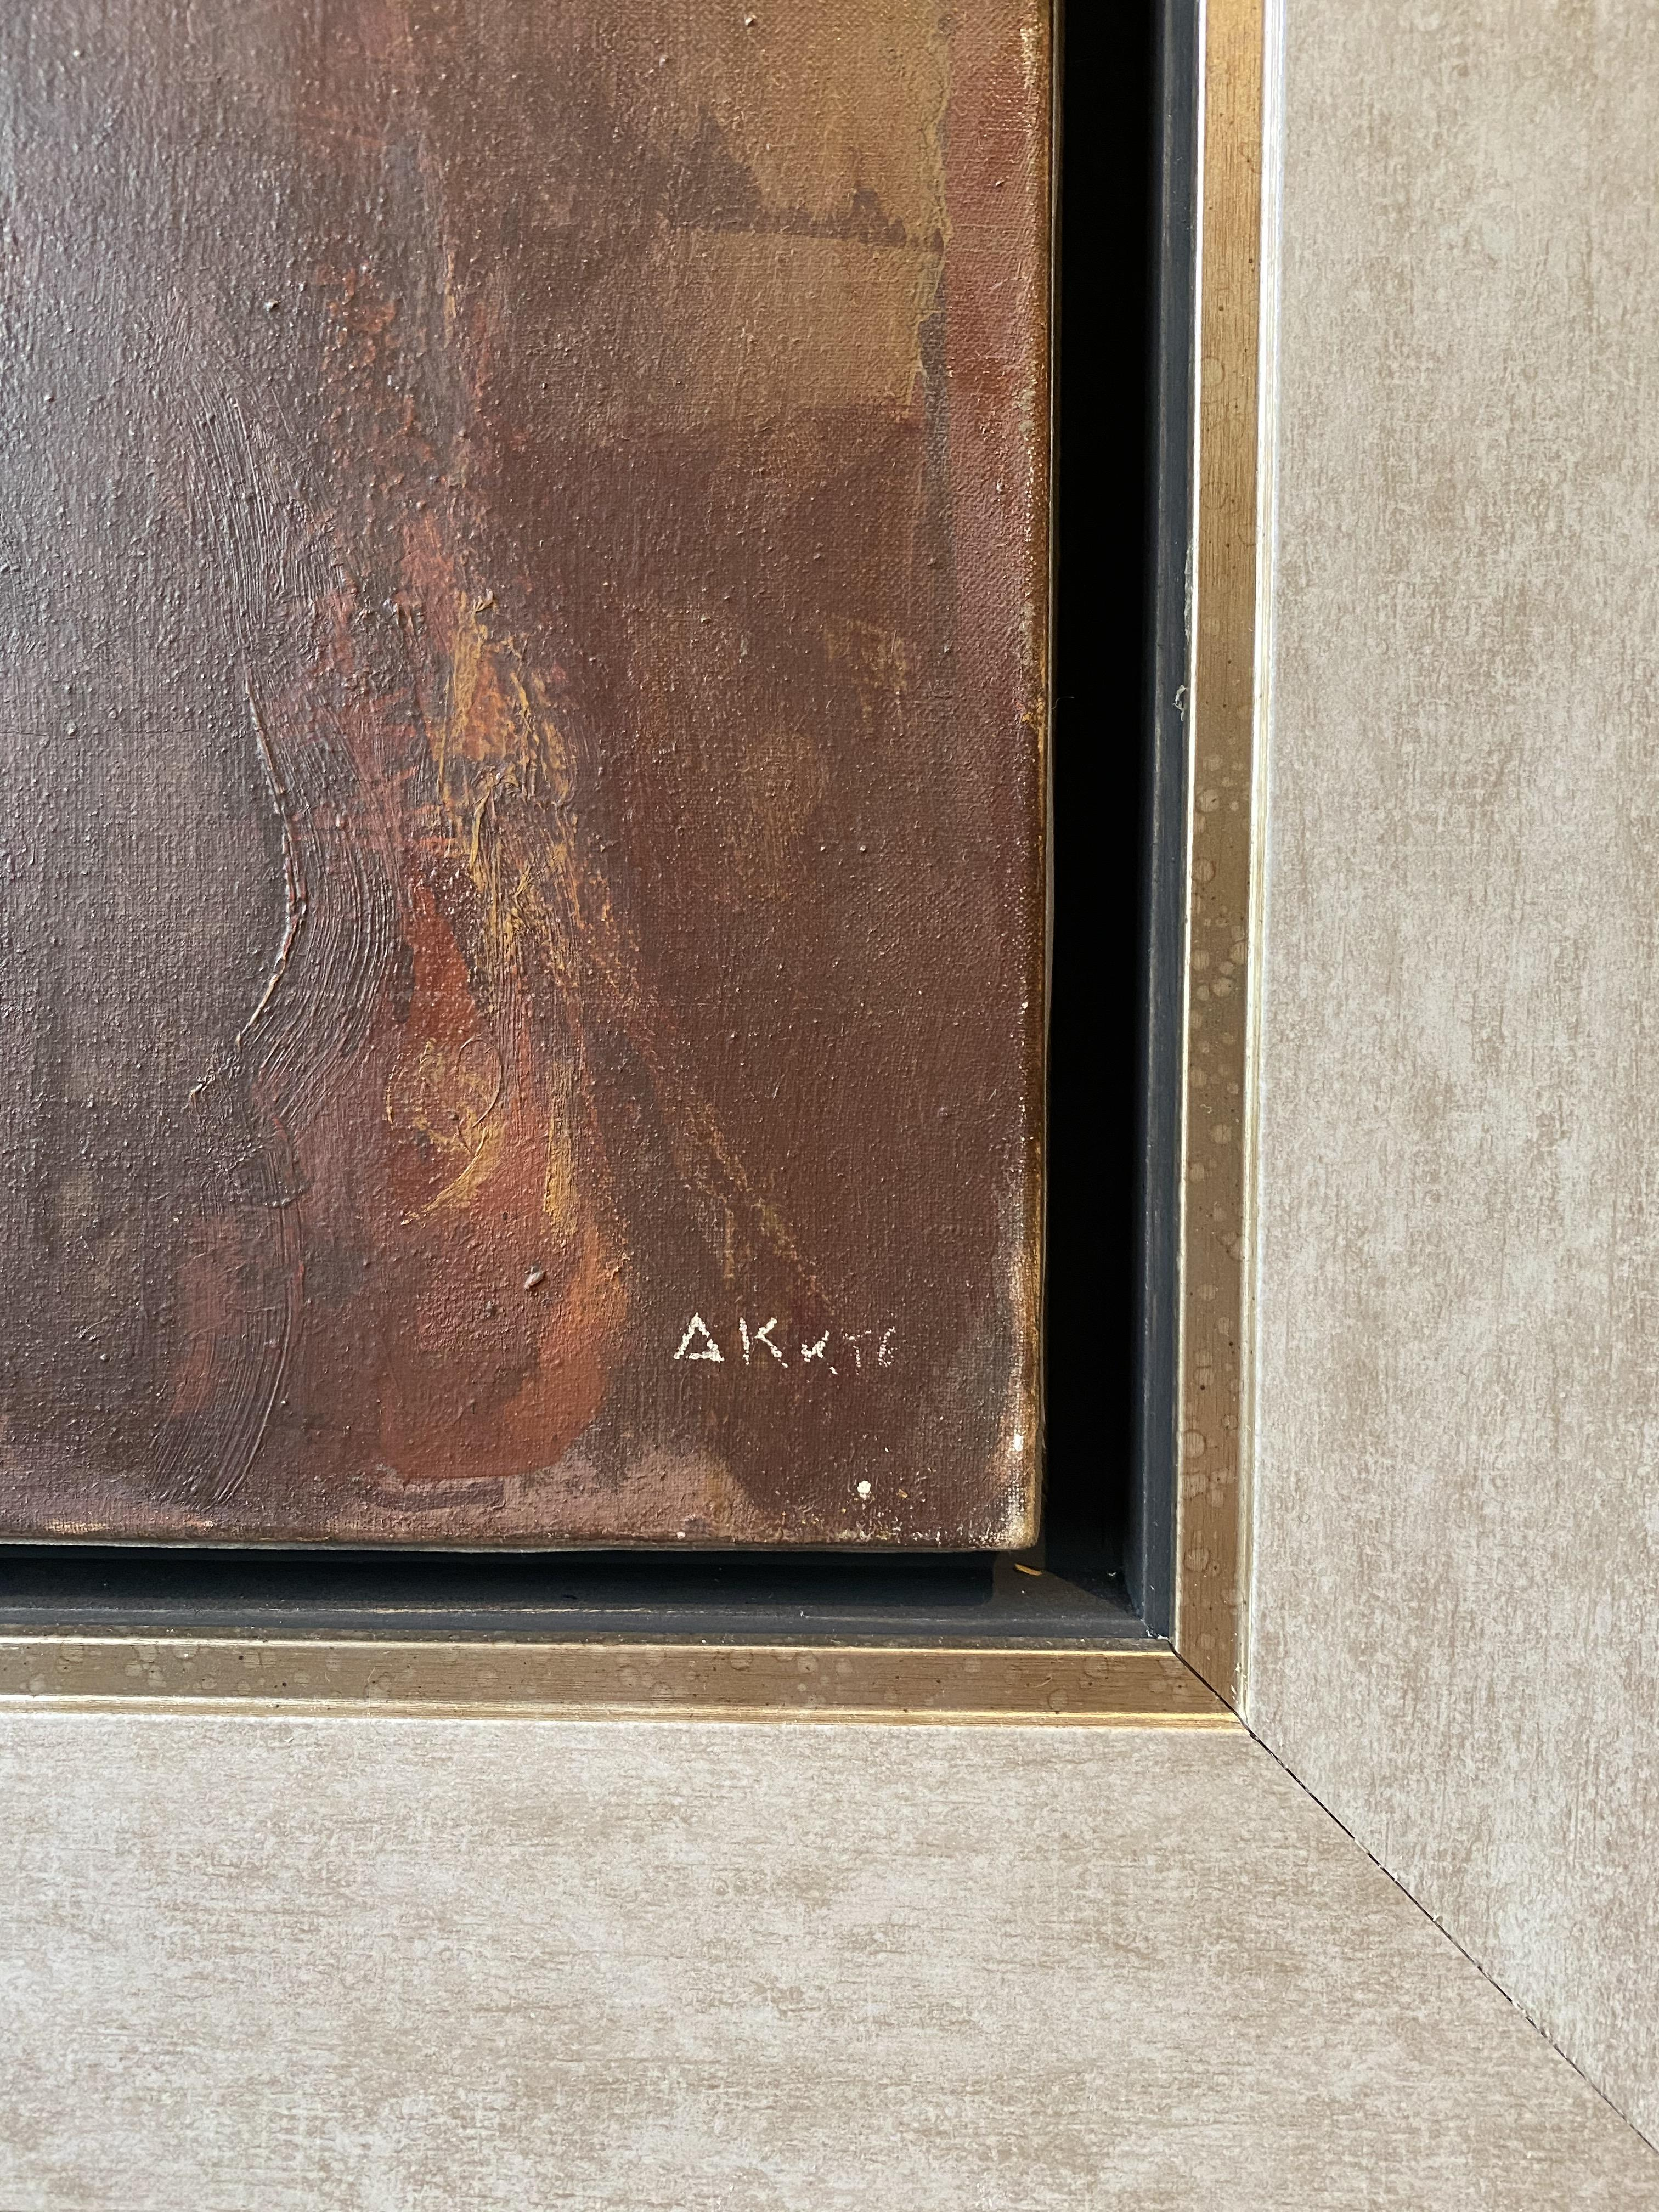 Dimitris Katsigiannis (Greek, born 1960) (AR), A Lady with a box,oil on canvas, 79 x 60 cm. - Image 3 of 3